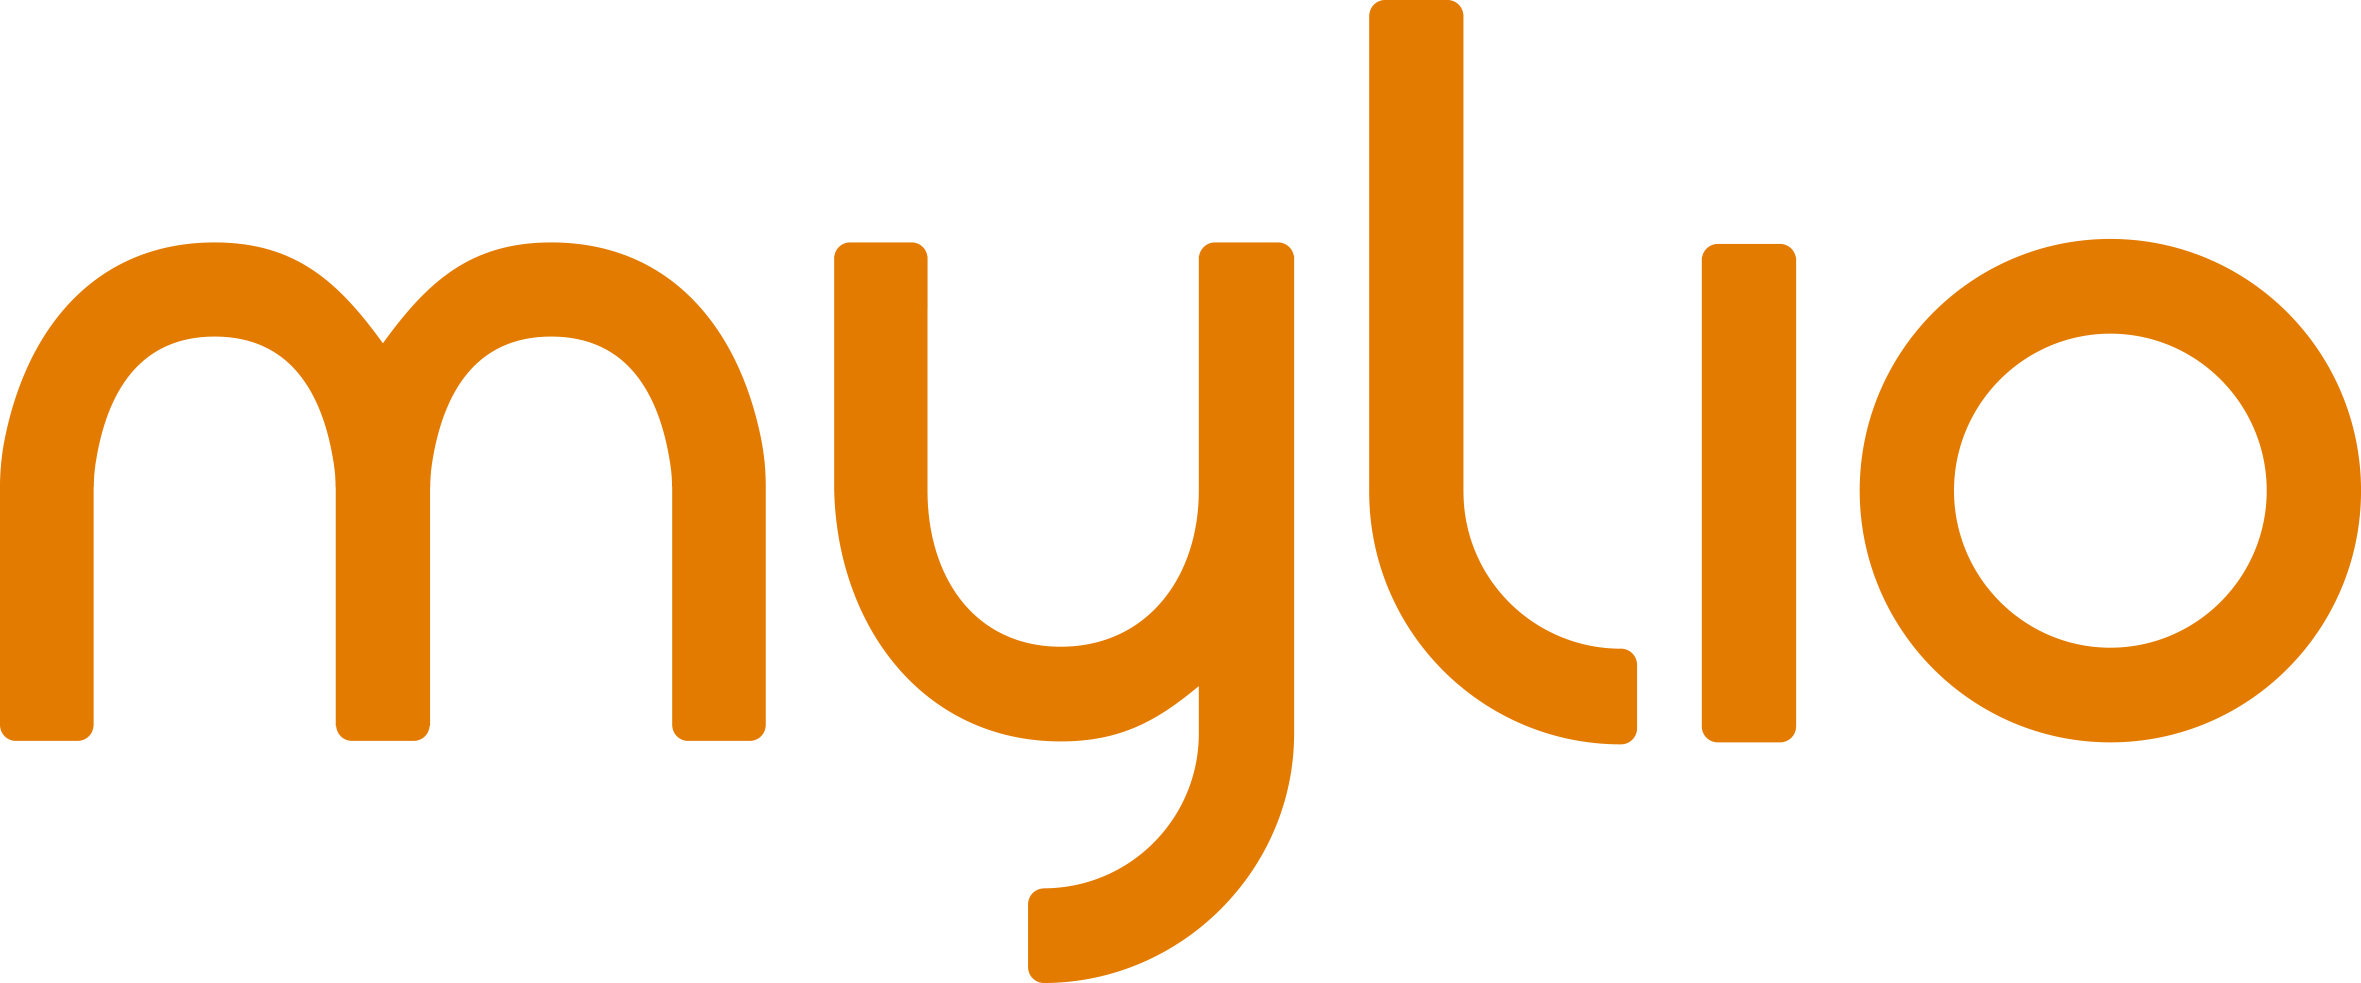 http://mylio.com/